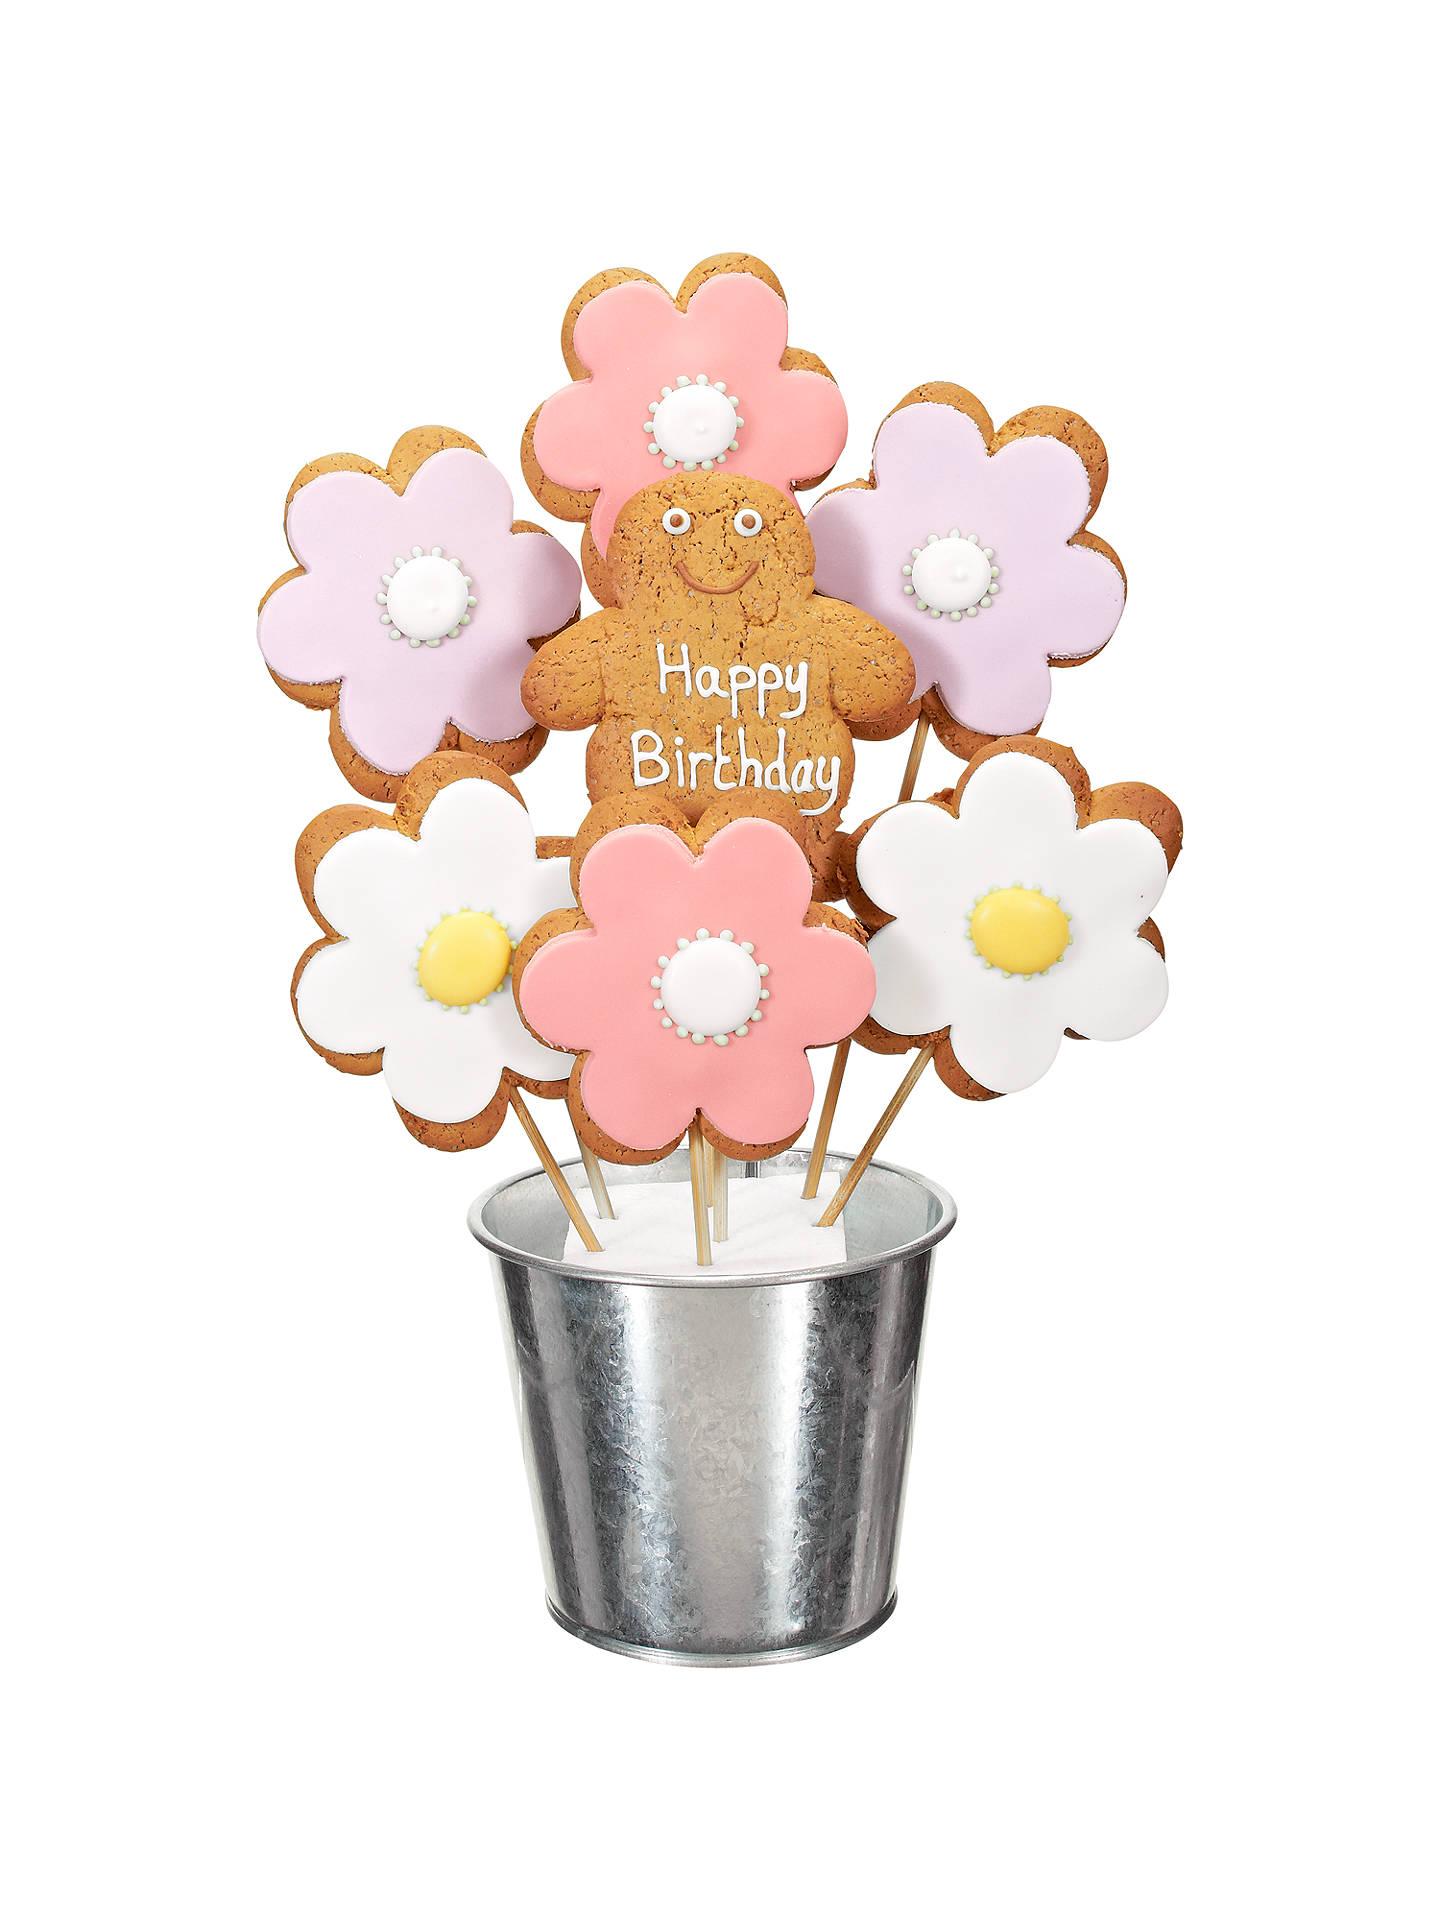 Image on food happy birthday flower gingerbread bouquet 350g at buyimage on food happy birthday flower gingerbread bouquet 350g online at johnlewis izmirmasajfo